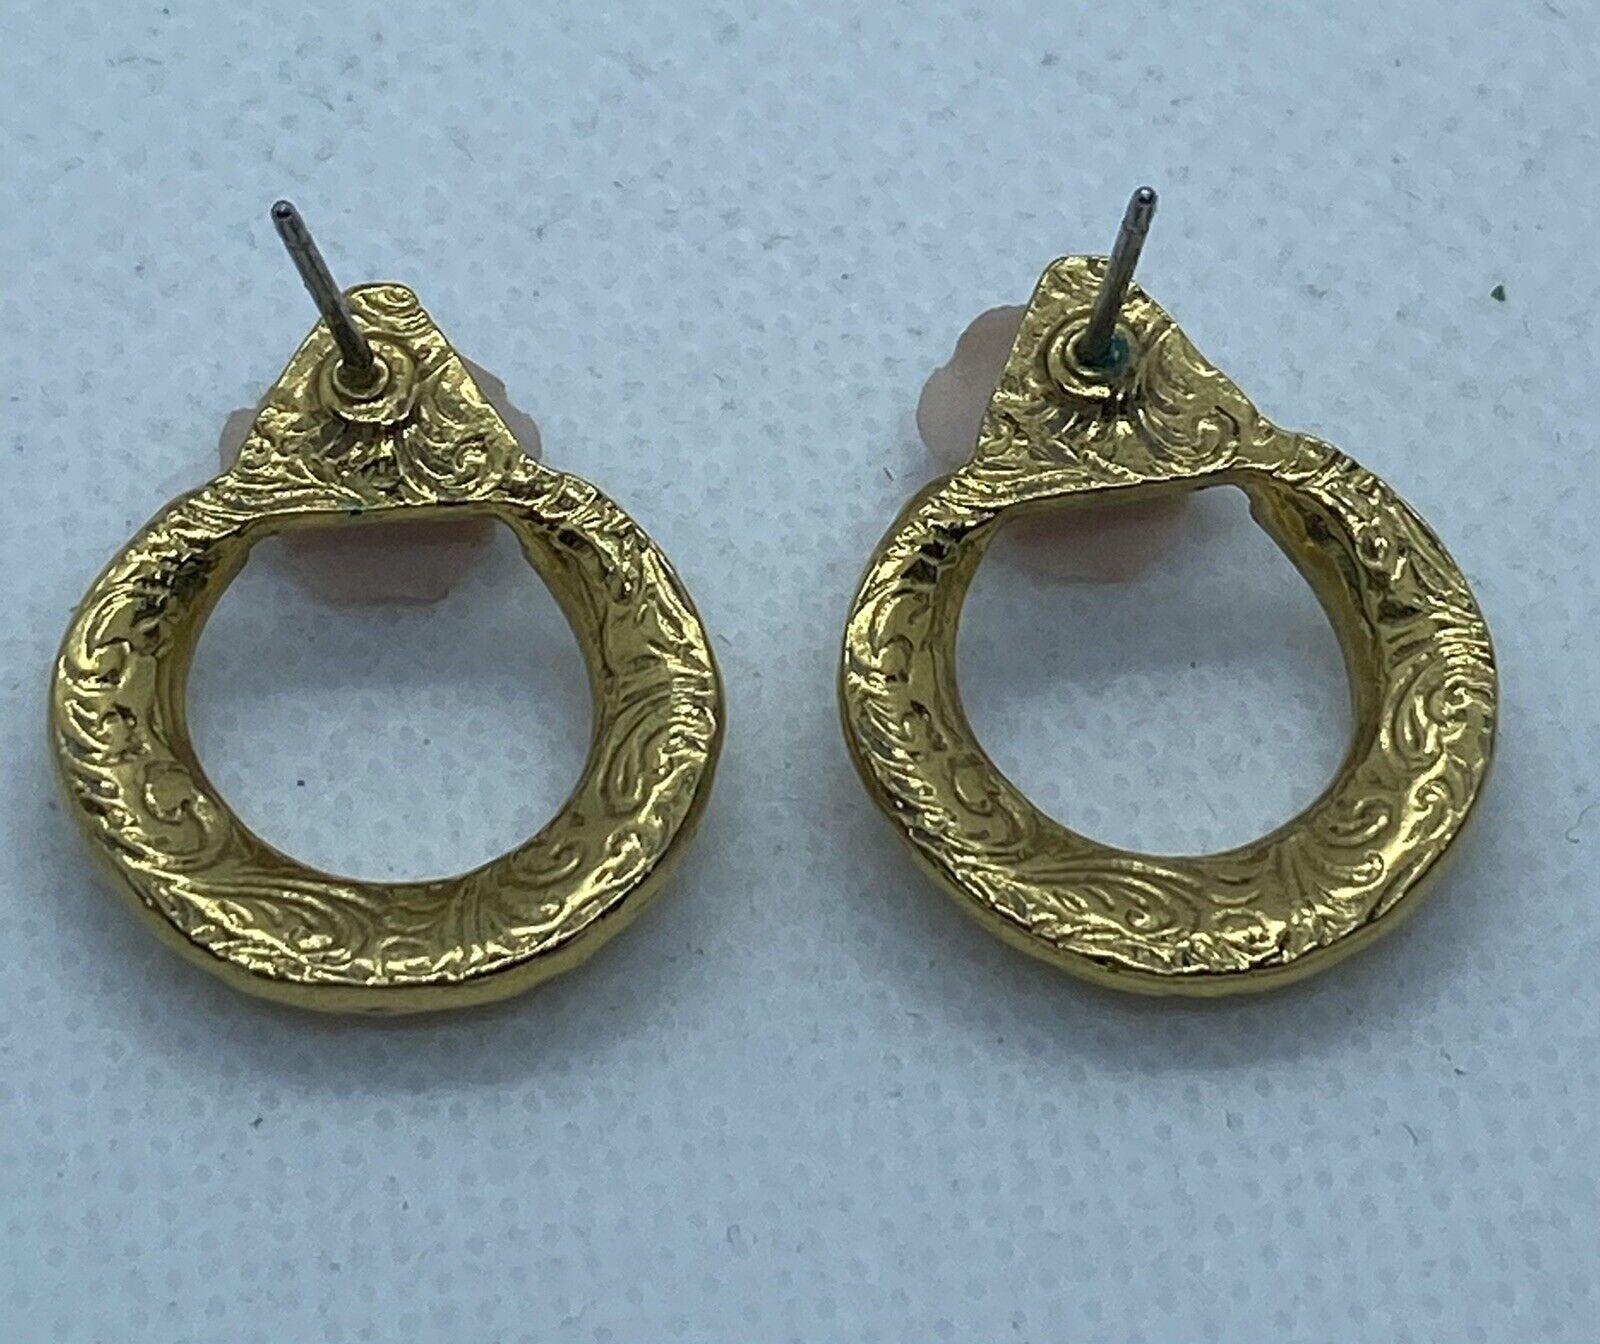 Vintage Ornate Gold Tone Lace Porcelain Rose Pear… - image 4